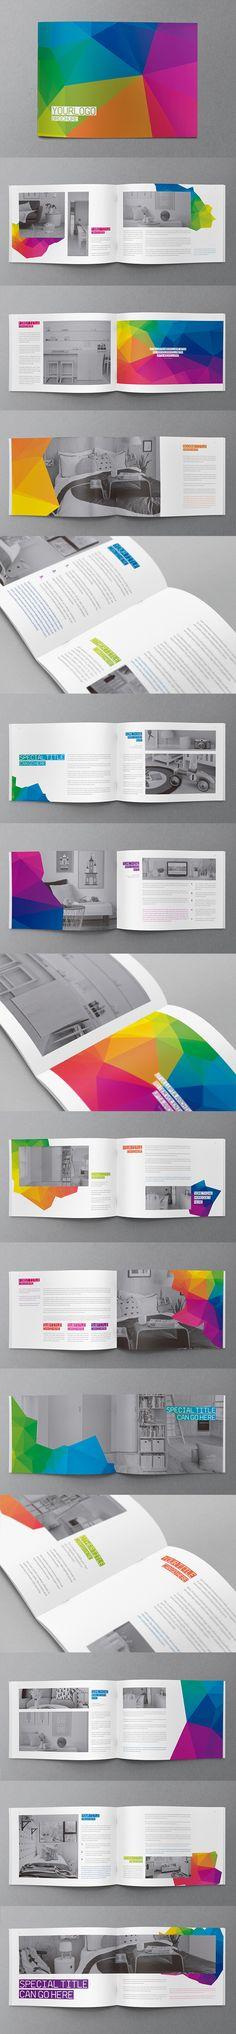 Abstract Modern Brochure. Download here: http://graphicriver.net/item/abstract-modern-brochure/11159106?ref=abradesign #brochure #design